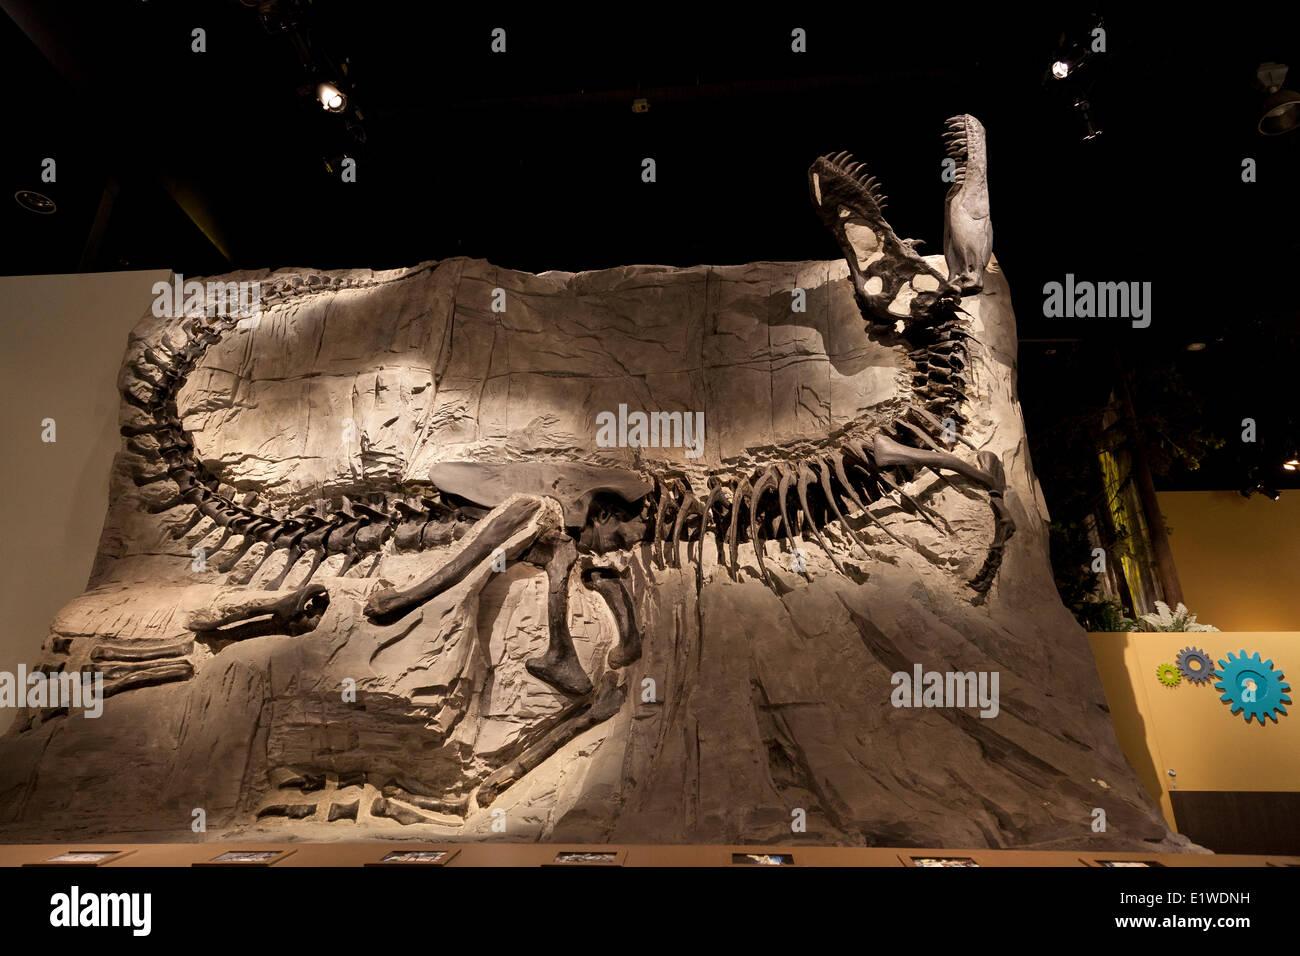 fossil bone stockfotos fossil bone bilder seite 2 alamy. Black Bedroom Furniture Sets. Home Design Ideas